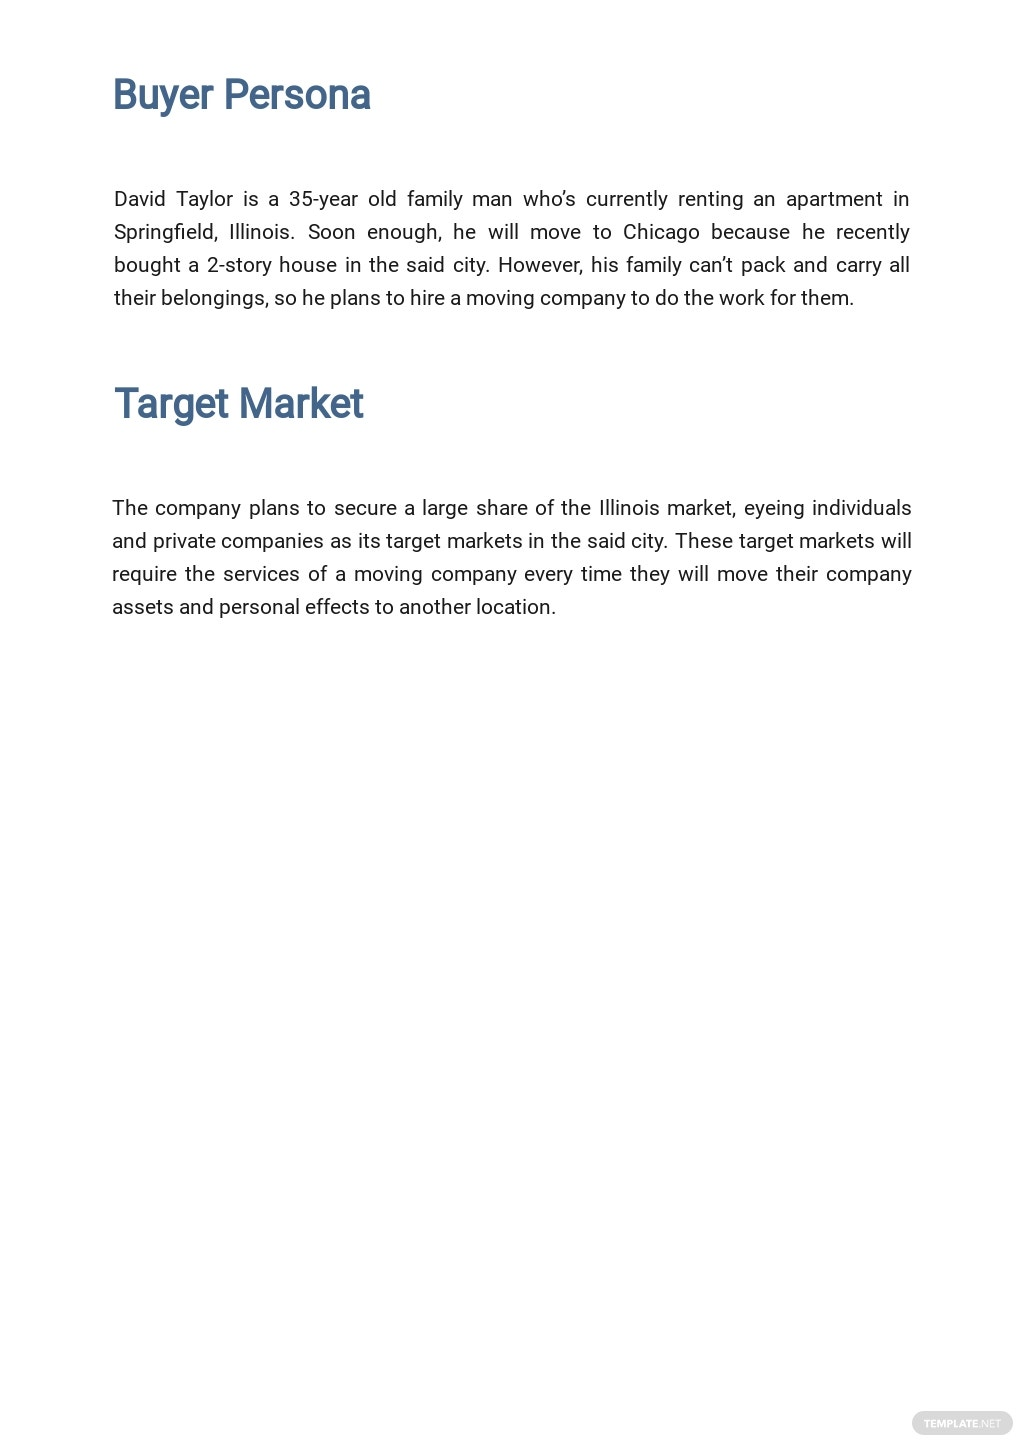 Moving Company Marketing Plan Template 2.jpe